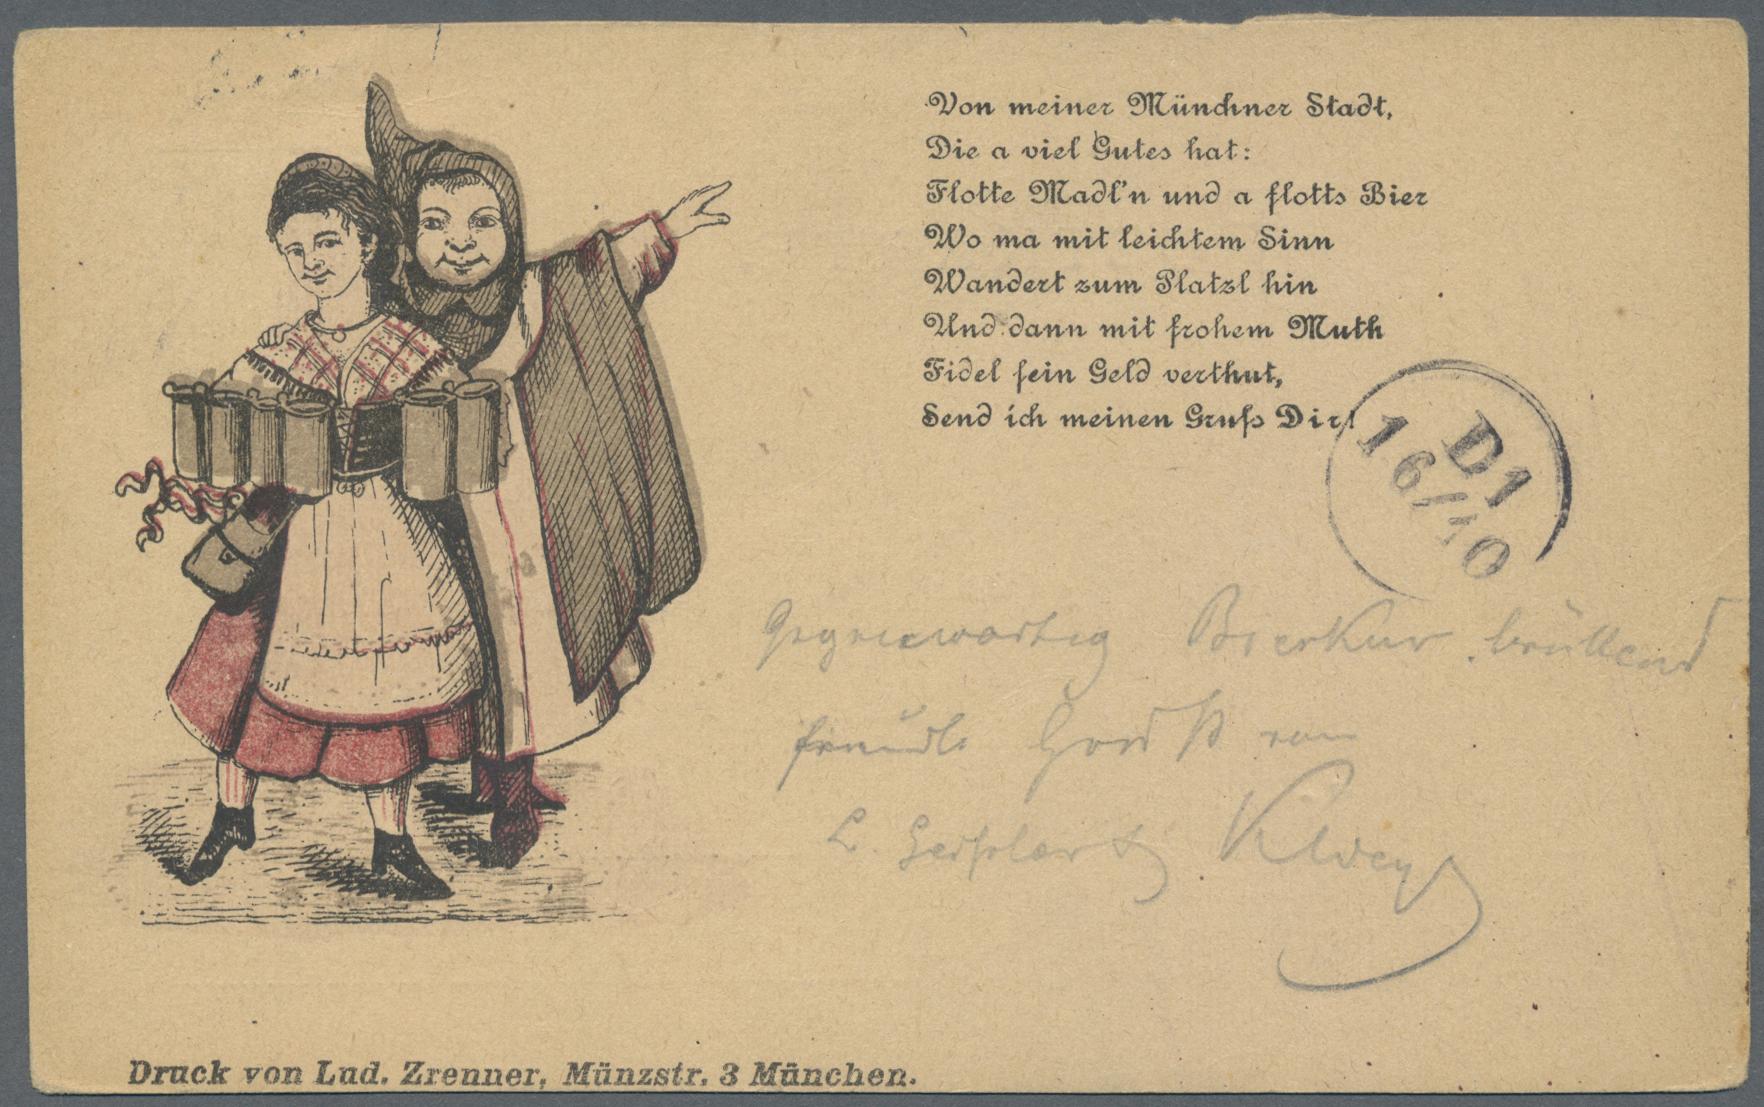 Lot 21187 - Ansichtskarten: Vorläufer  -  Auktionshaus Christoph Gärtner GmbH & Co. KG Auction #40 Germany, Picture Post Cards, Collections Overseas, Thematics